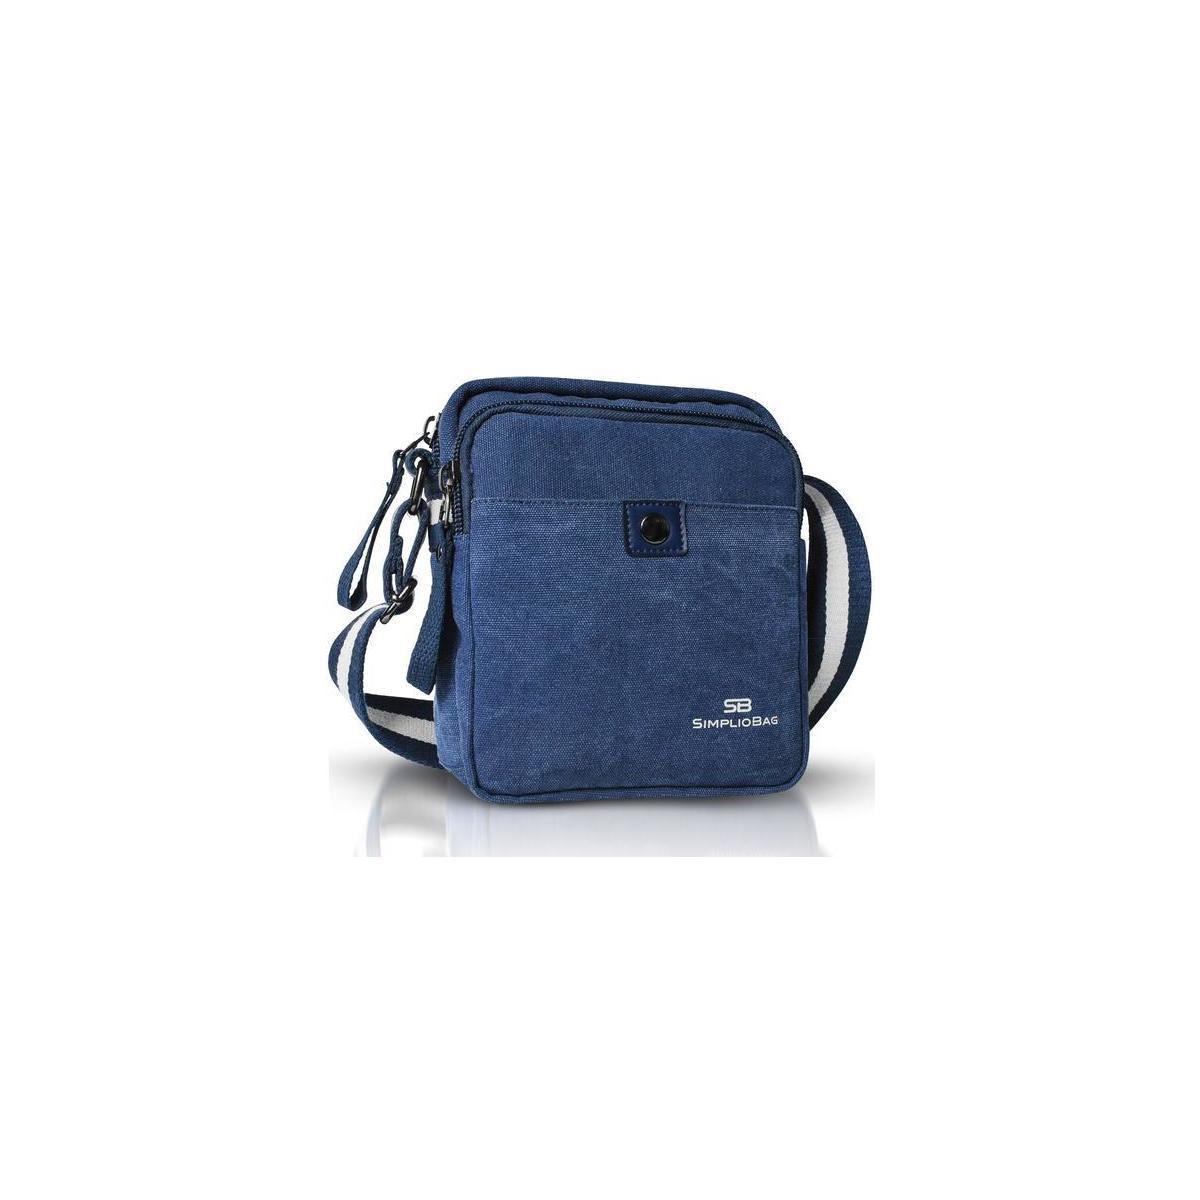 SIMPLIO Small Messenger Bag for Men   Shoulder Mini Canvas Mens Crossbody Bag for Casual Travel, Outdoor, Work & Business